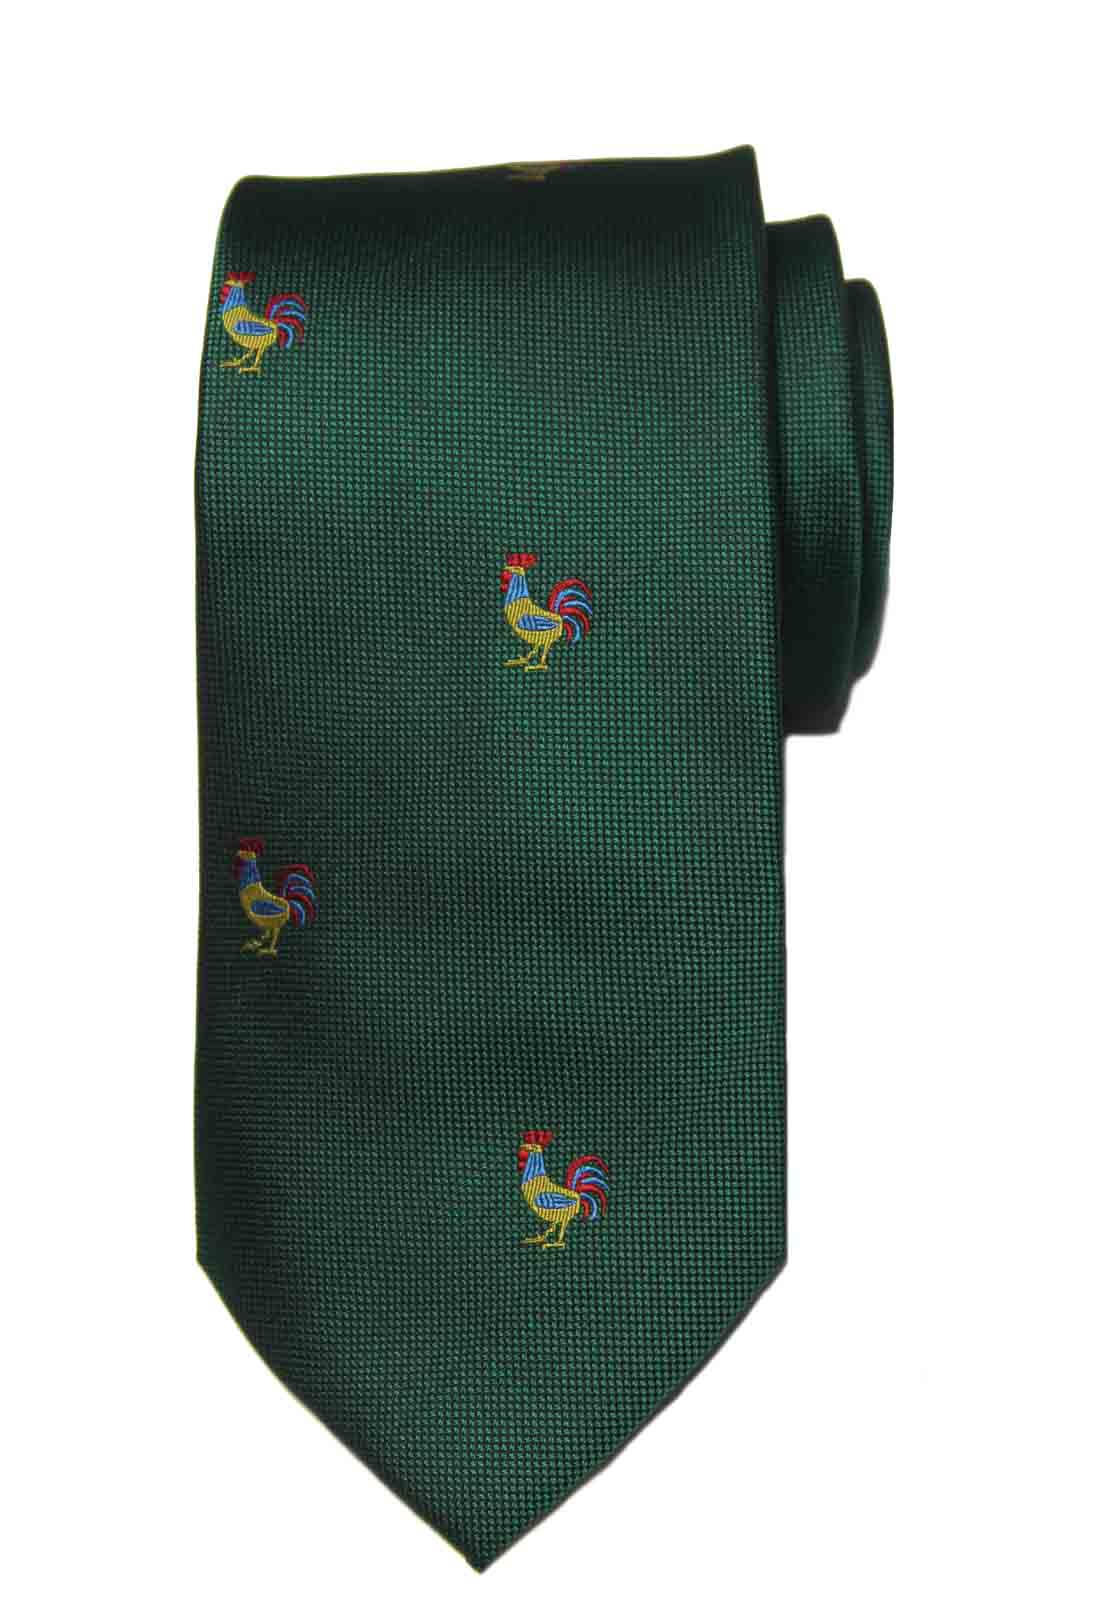 Barry Wang Silk Tie Green Rooster Pattern Green Men's